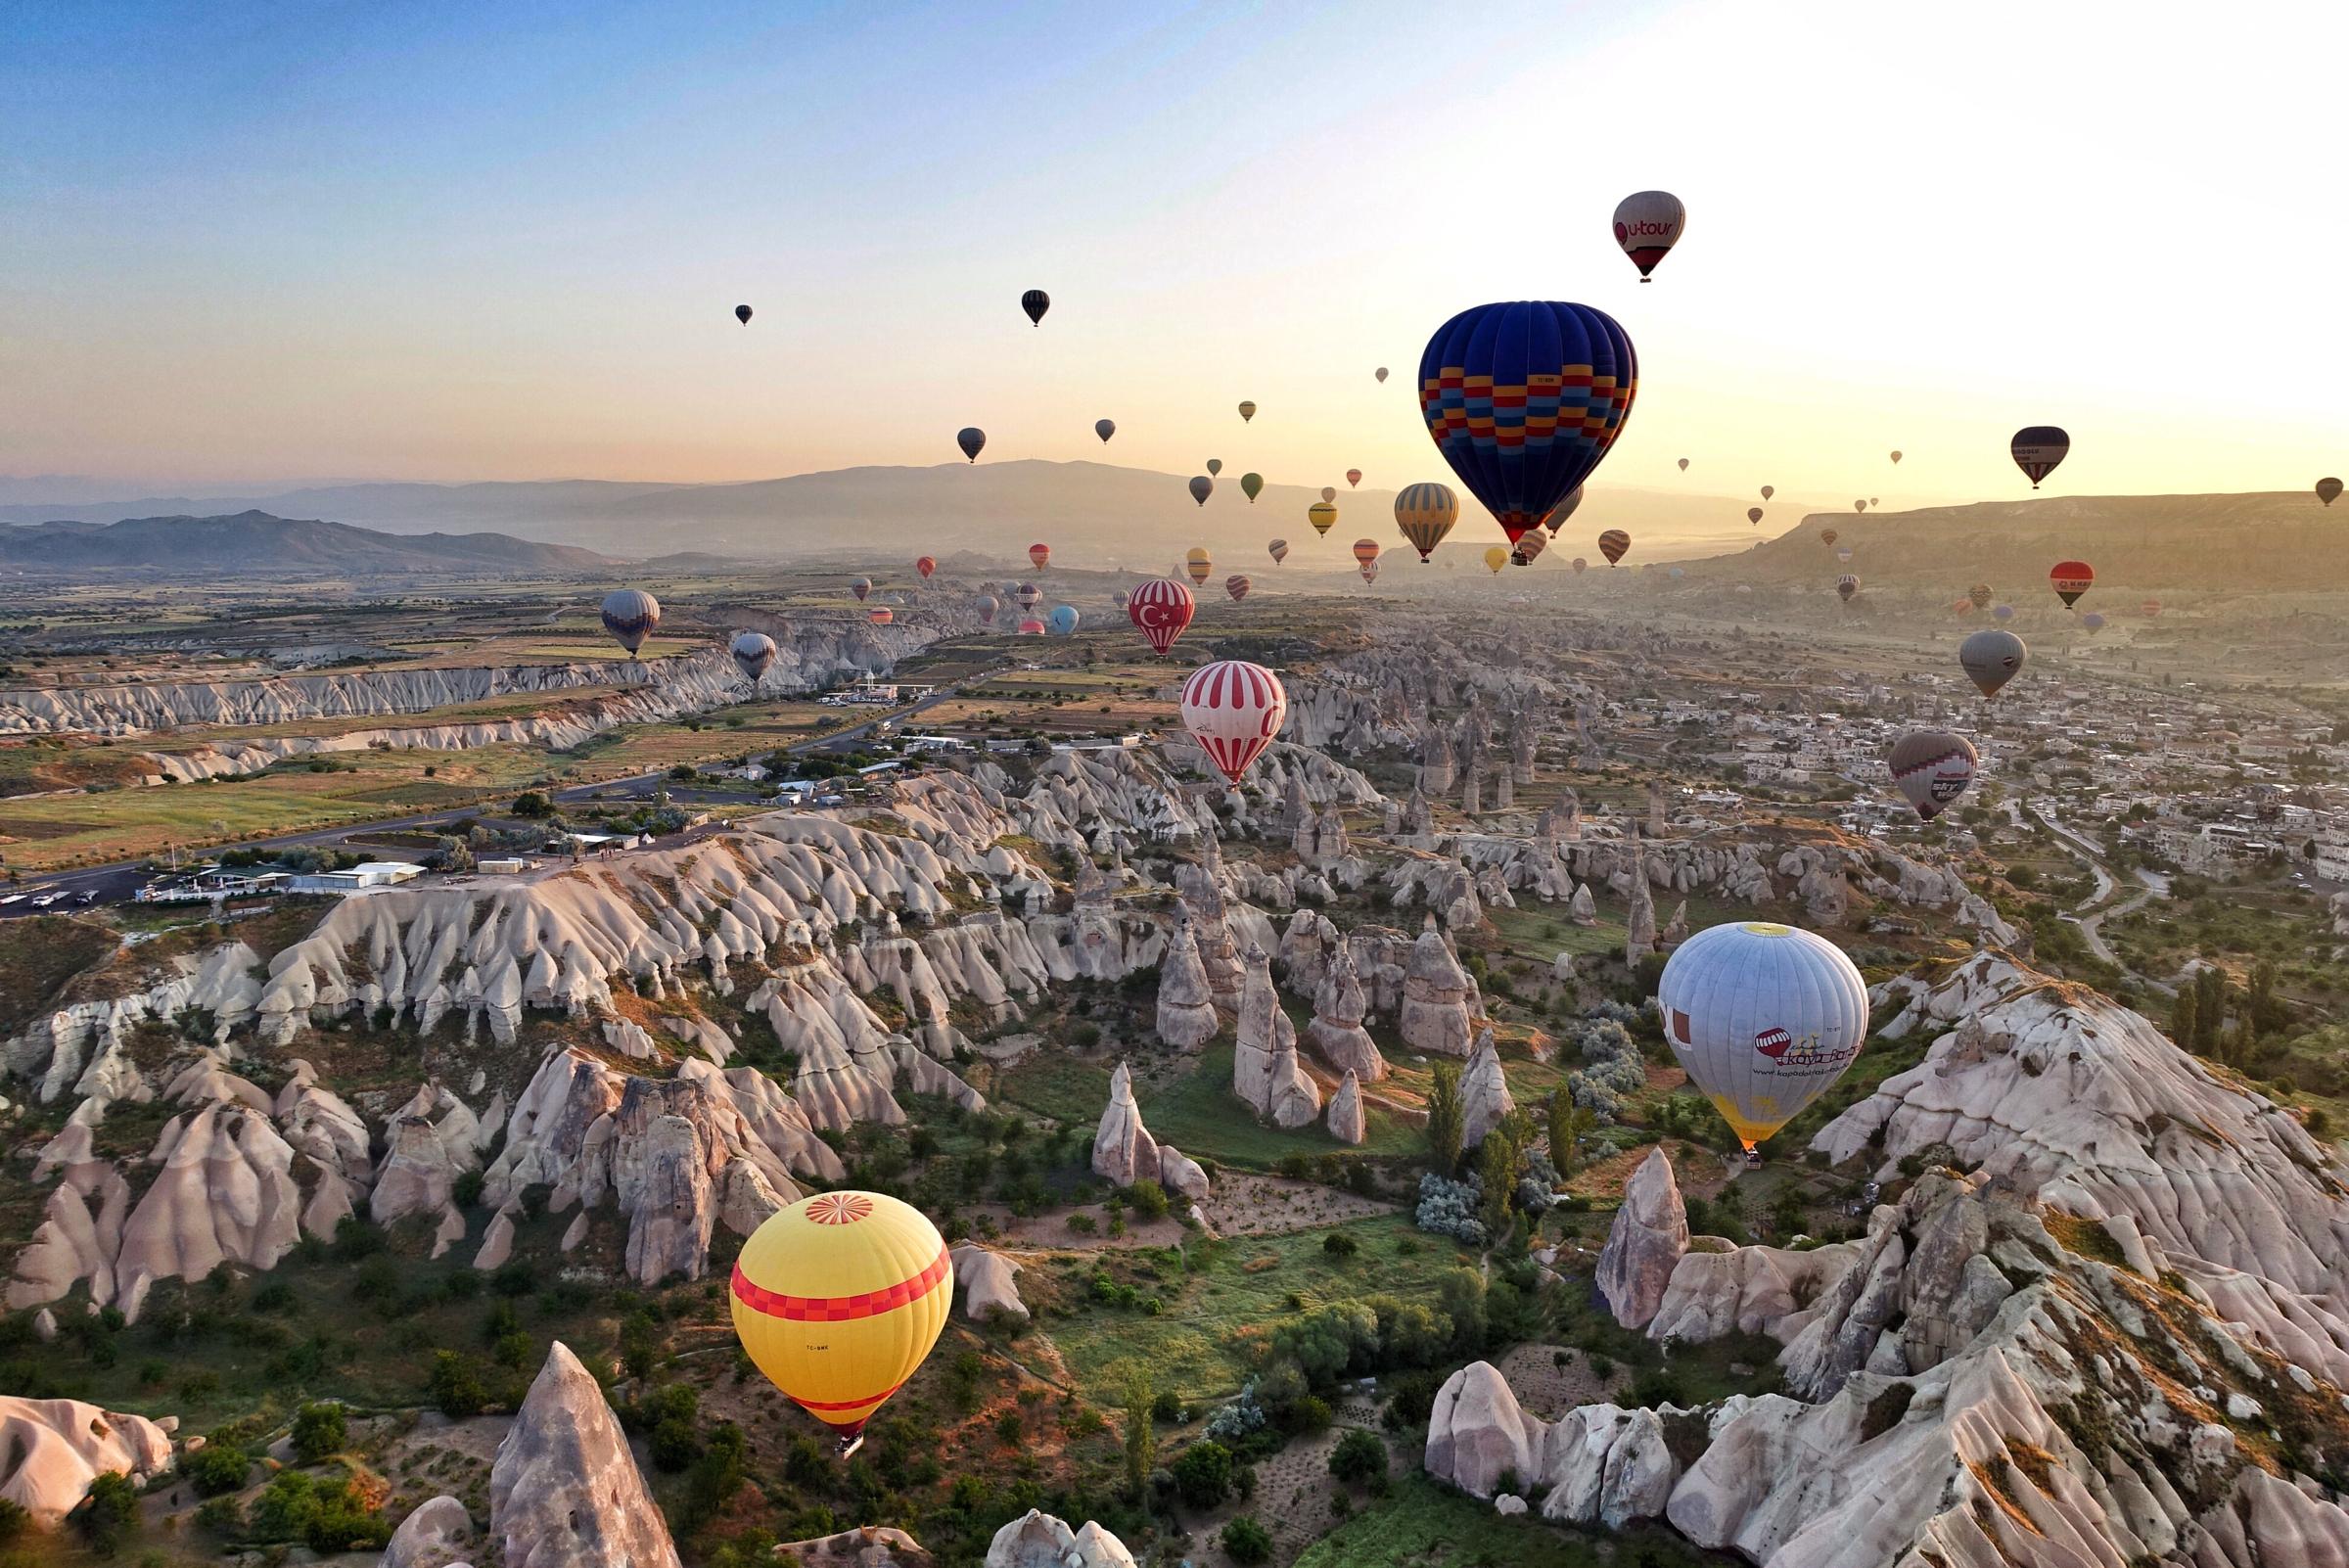 Project Kaif - Kaif moment - What is Kaif - Cappadocia, Turkey - ballooning